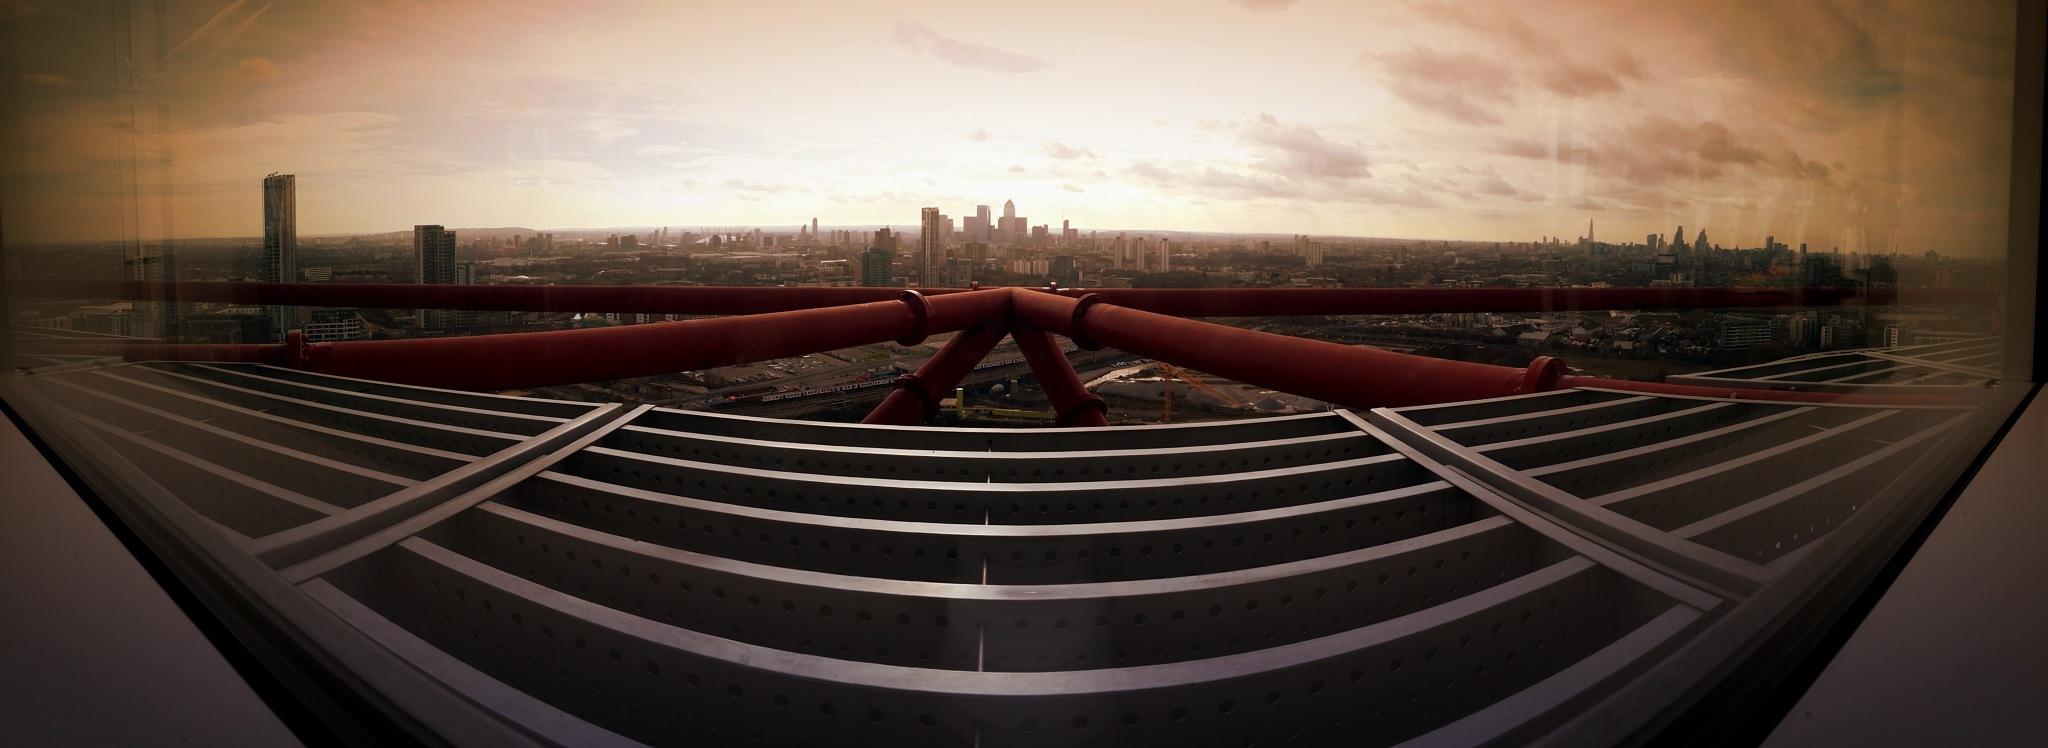 London Skyline  by Graham Brooks